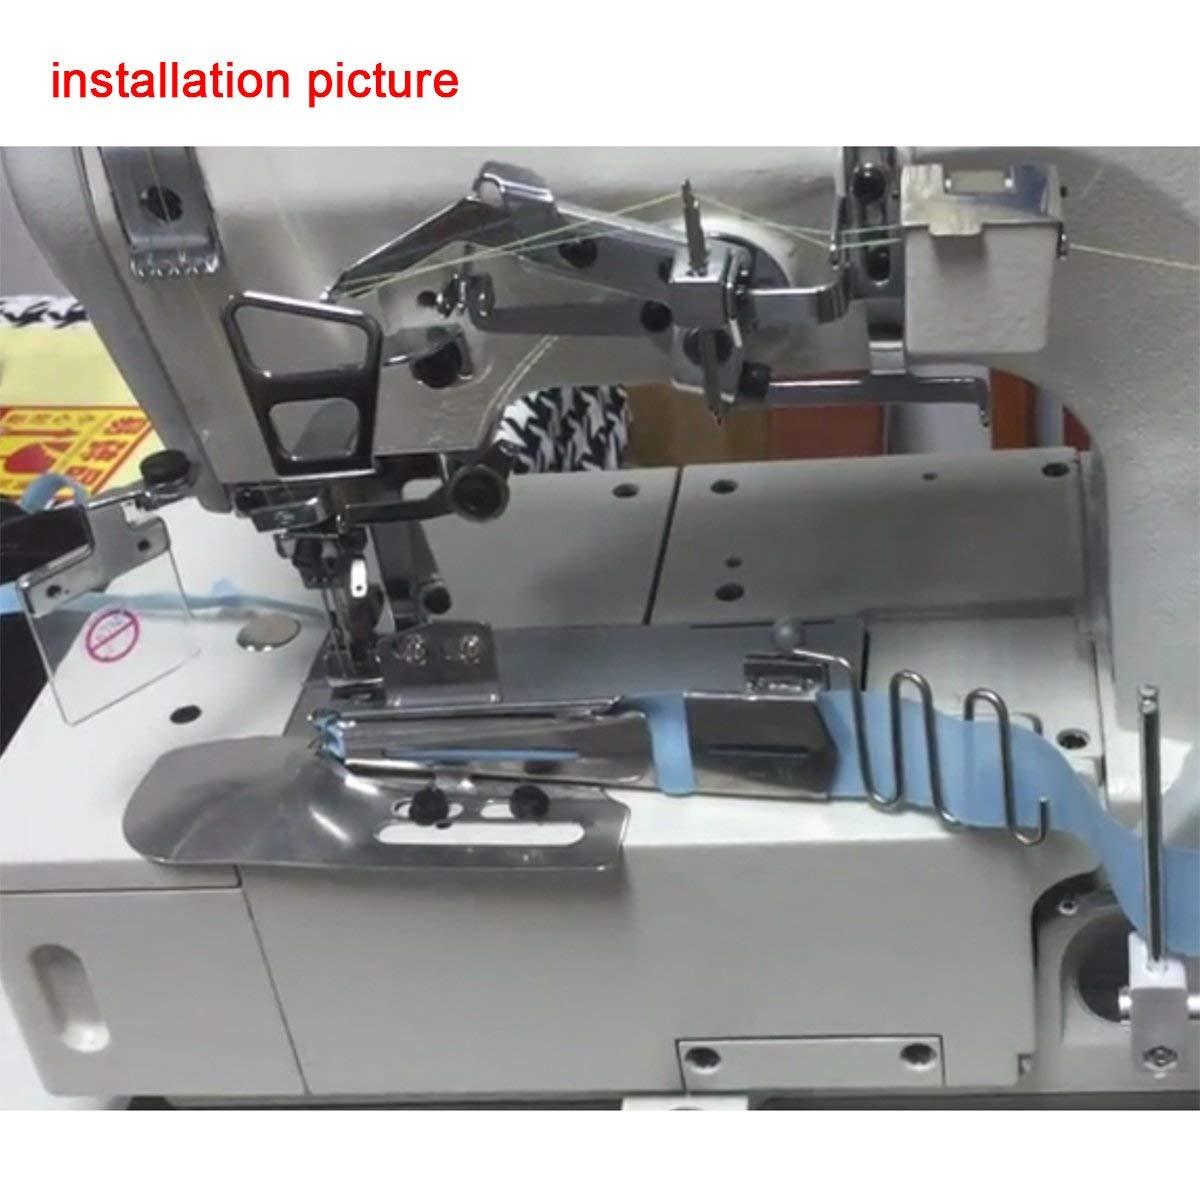 Kunpeng # KP-104 CoverStitch Machine Binder, Double-Fold Binding Attahchment For Flatbed Machine (1-3/4 (44.45mm) CUT;9/16 (14.29mm) FINISH)